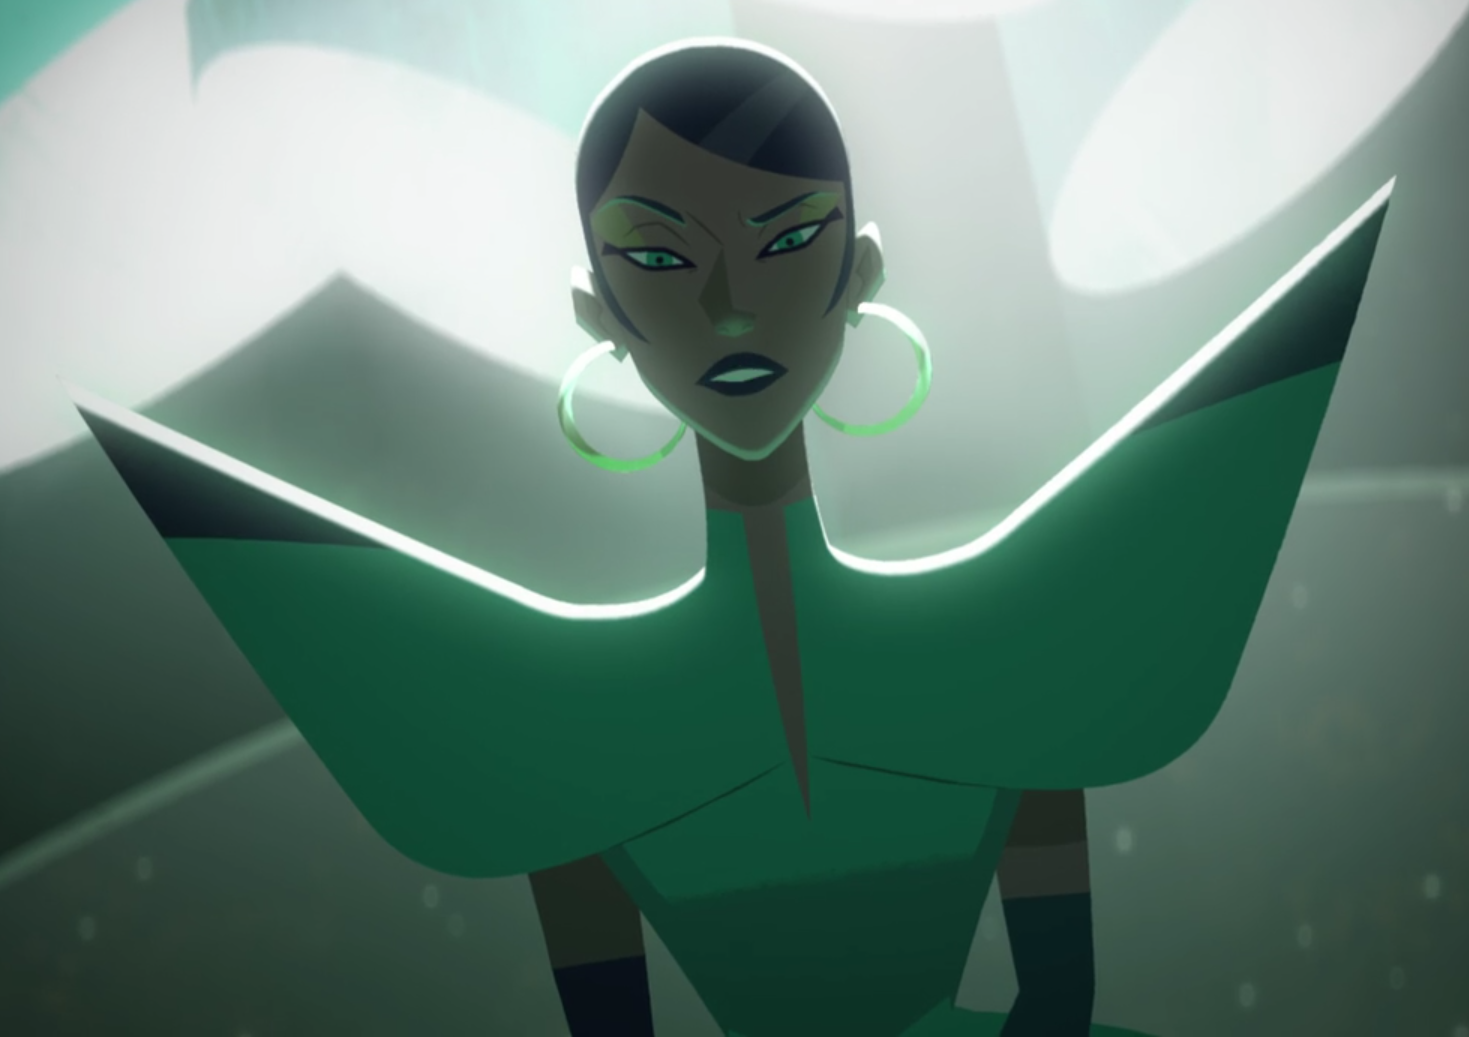 Countess Cleo (Carmen Sandiego)